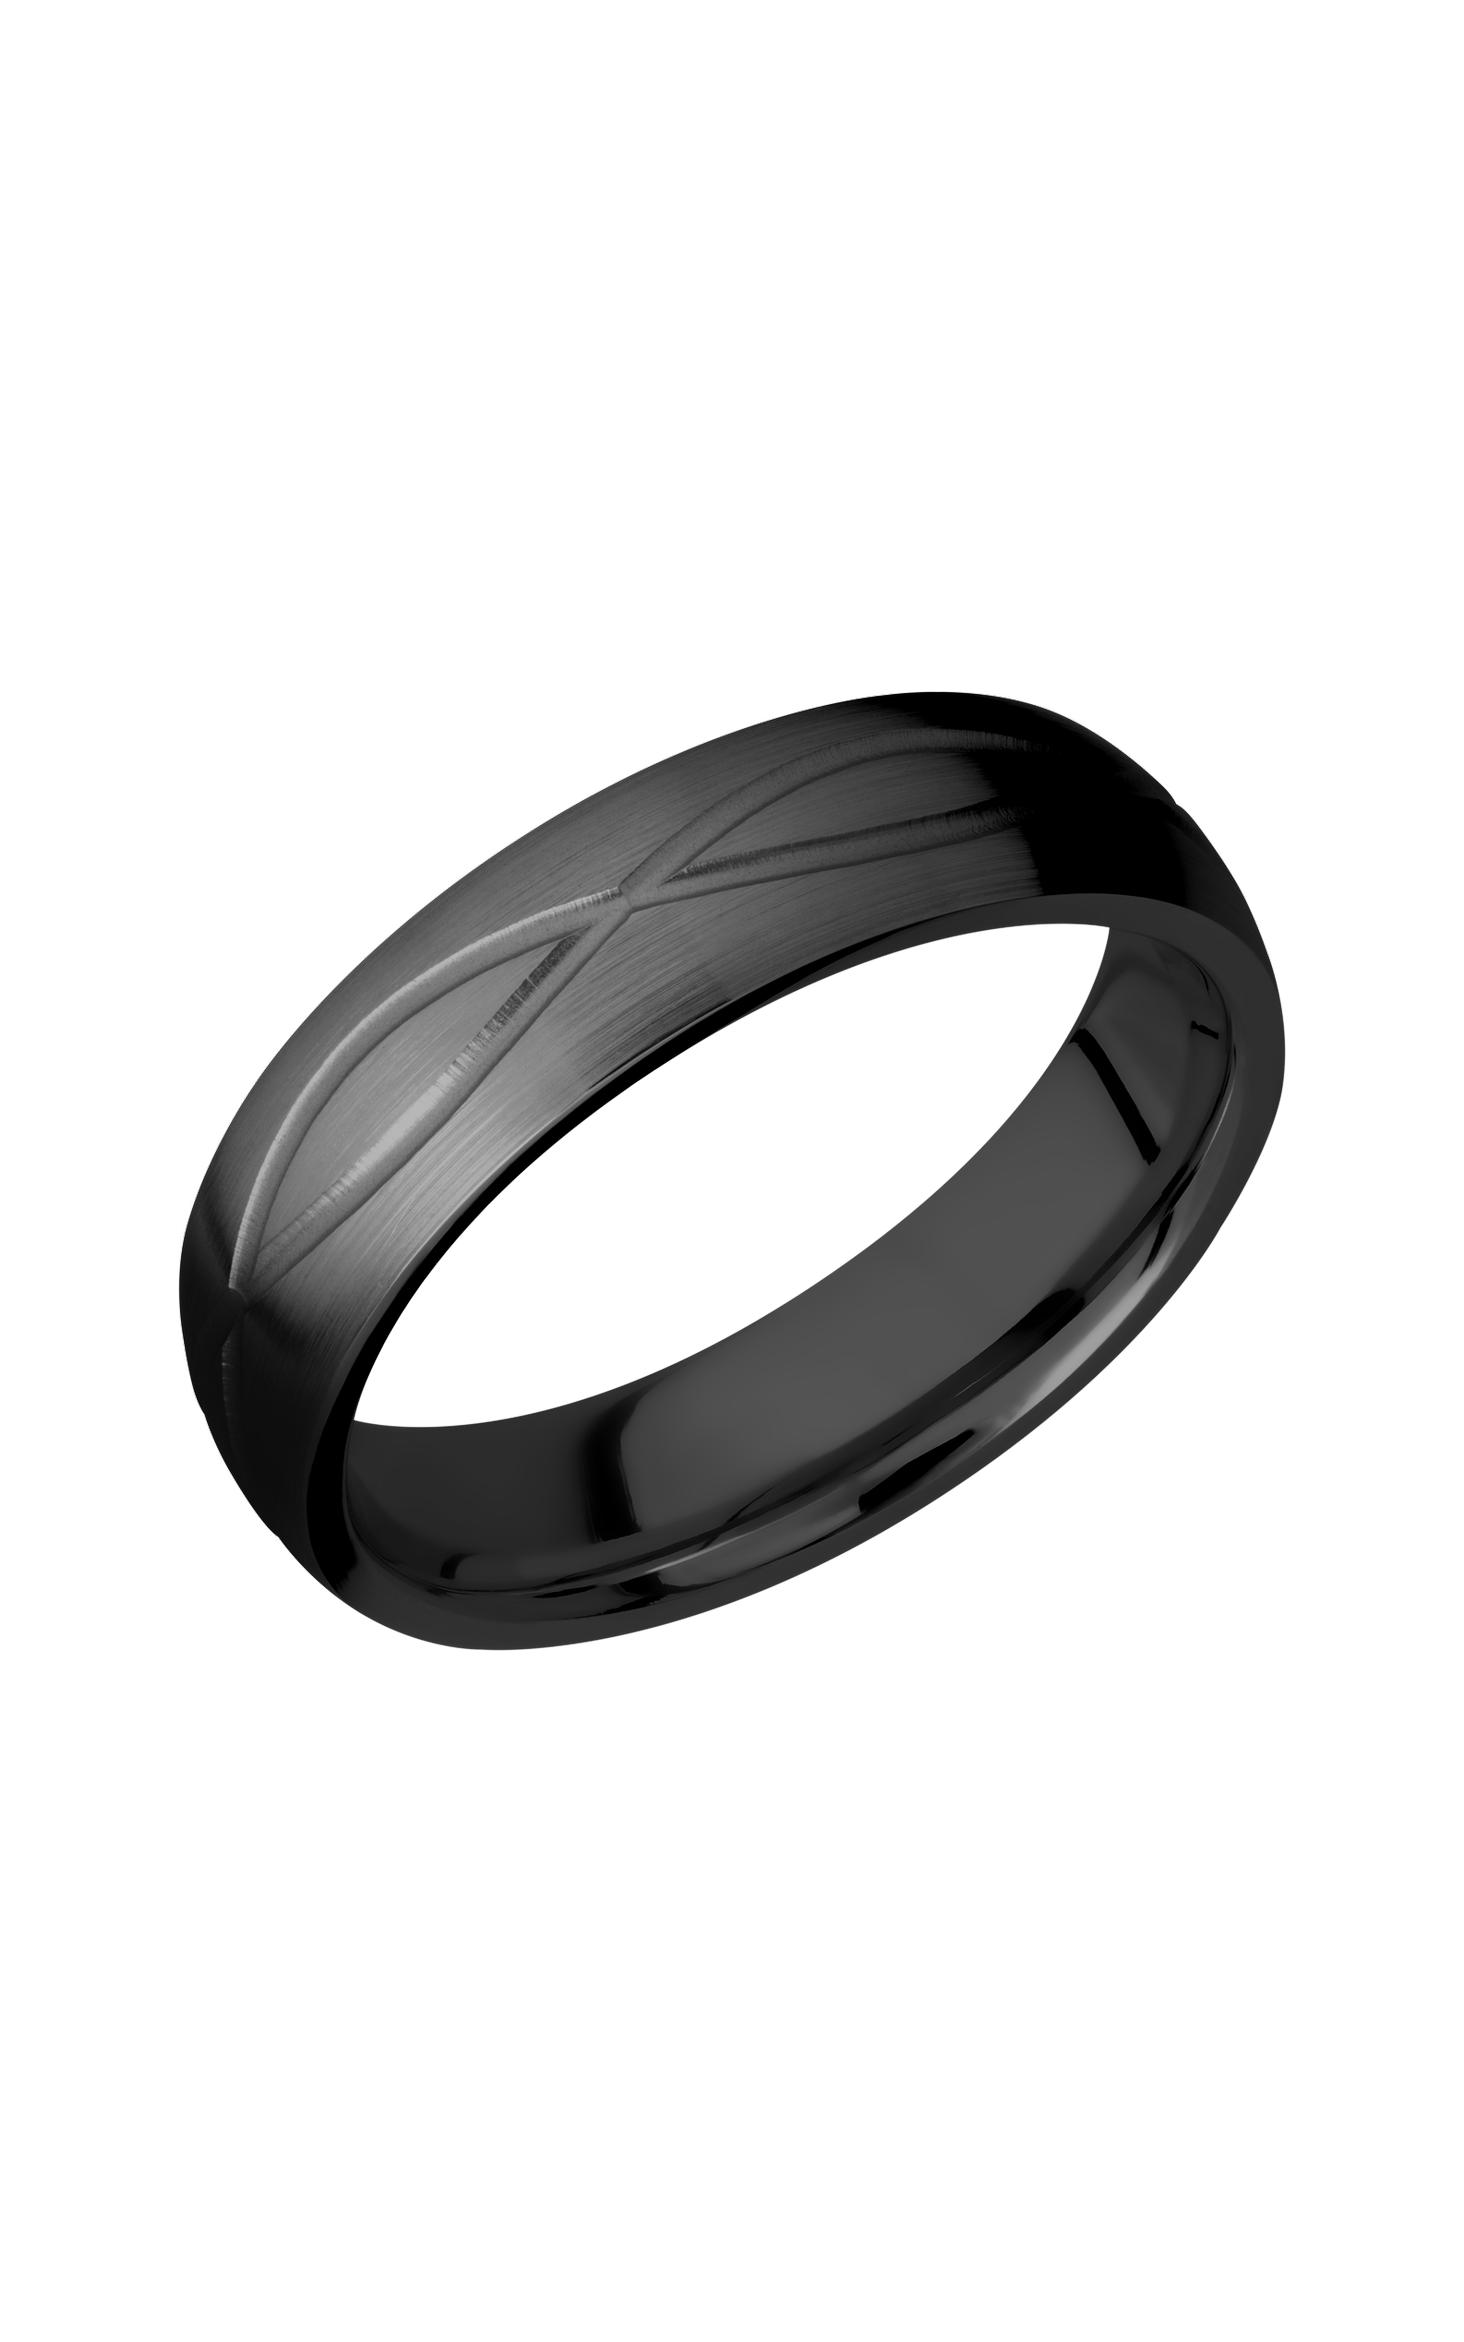 Lashbrook Zirconium Z6DINF product image